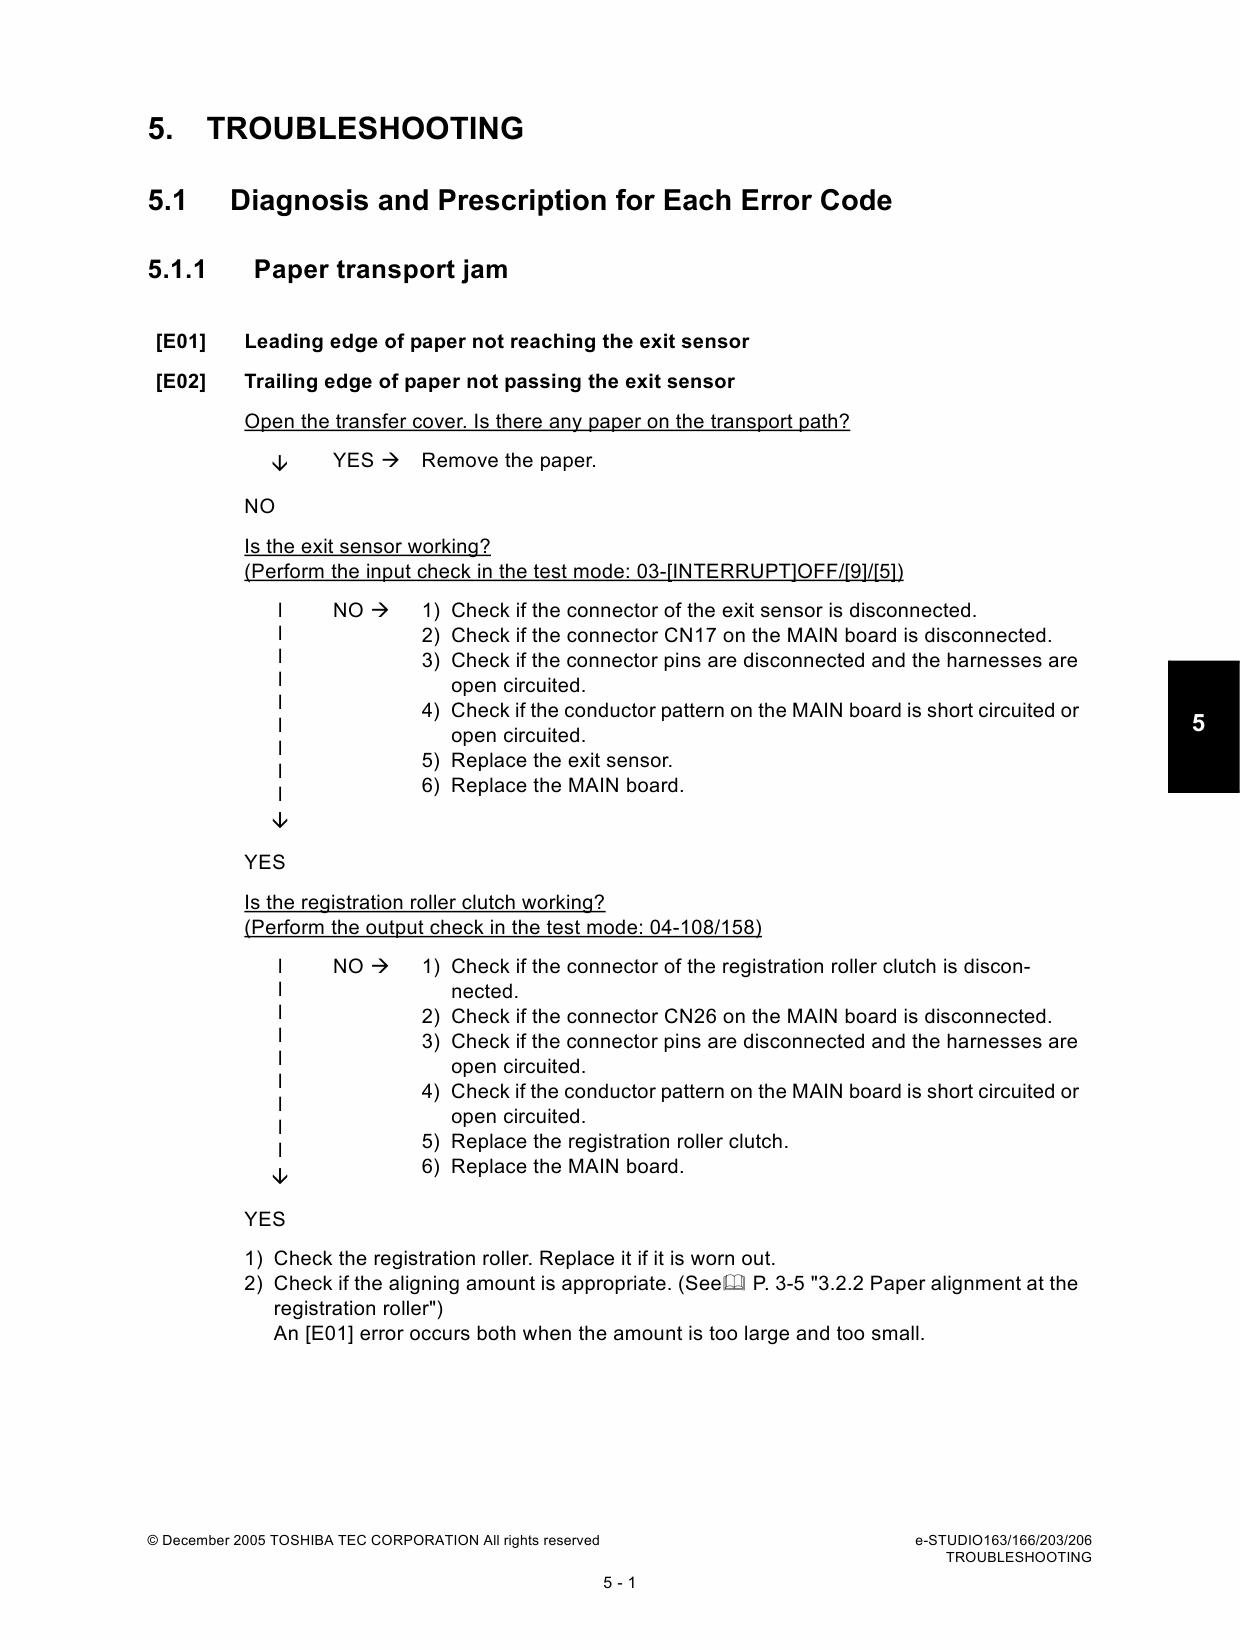 инструкция toshiba e-studio 163